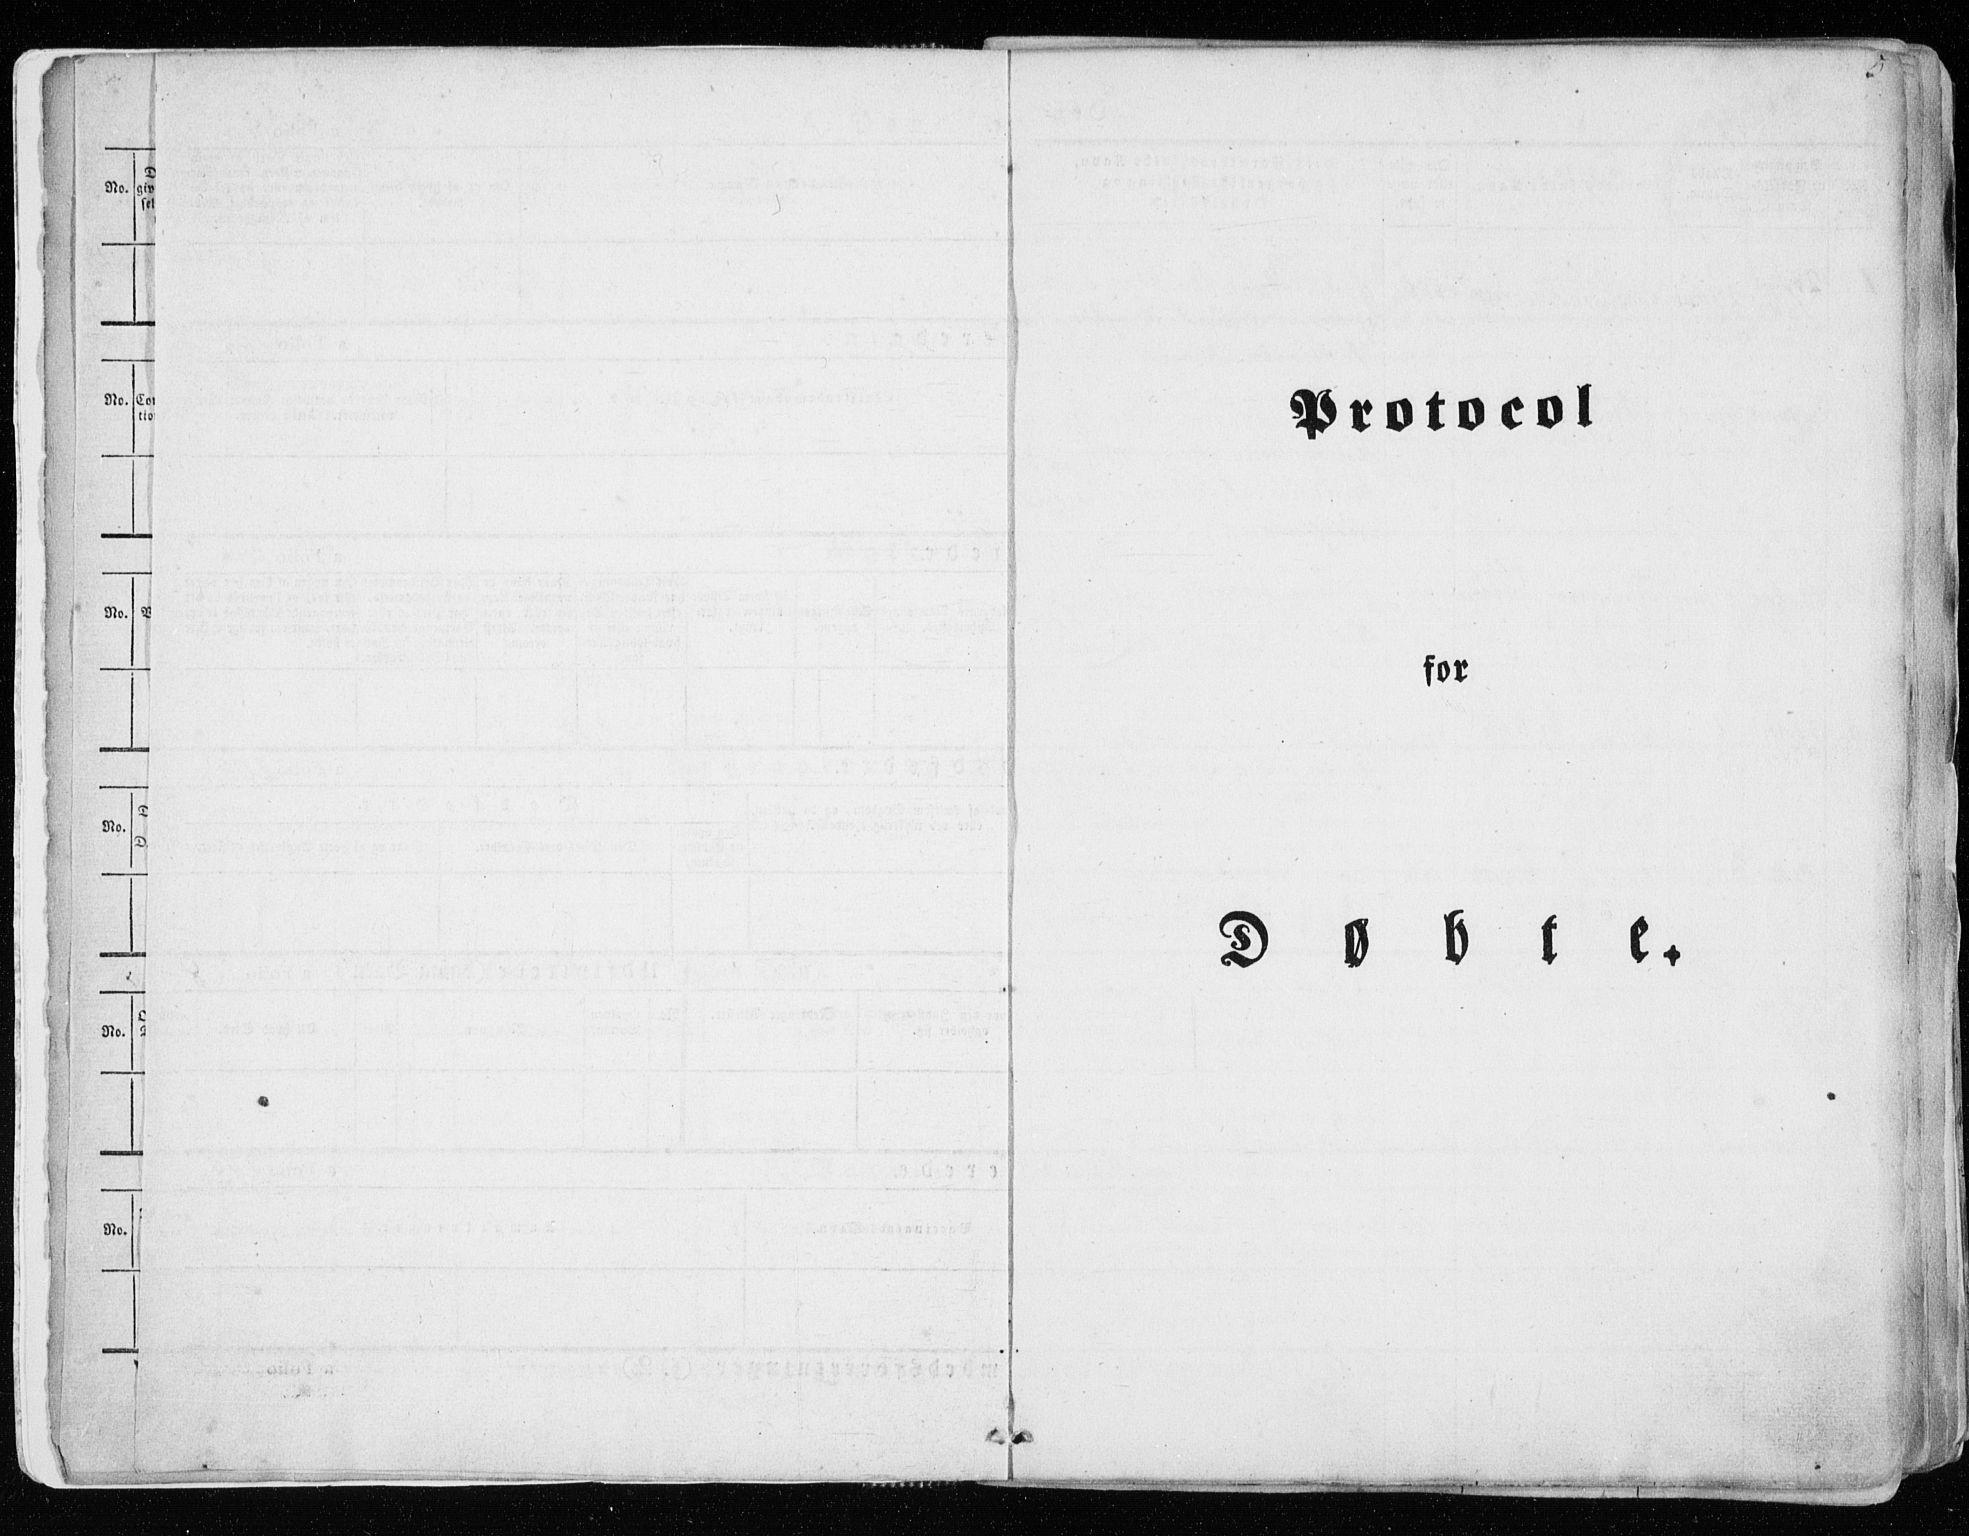 SATØ, Tranøy sokneprestkontor, I/Ia/Iaa/L0006kirke: Ministerialbok nr. 6, 1844-1855